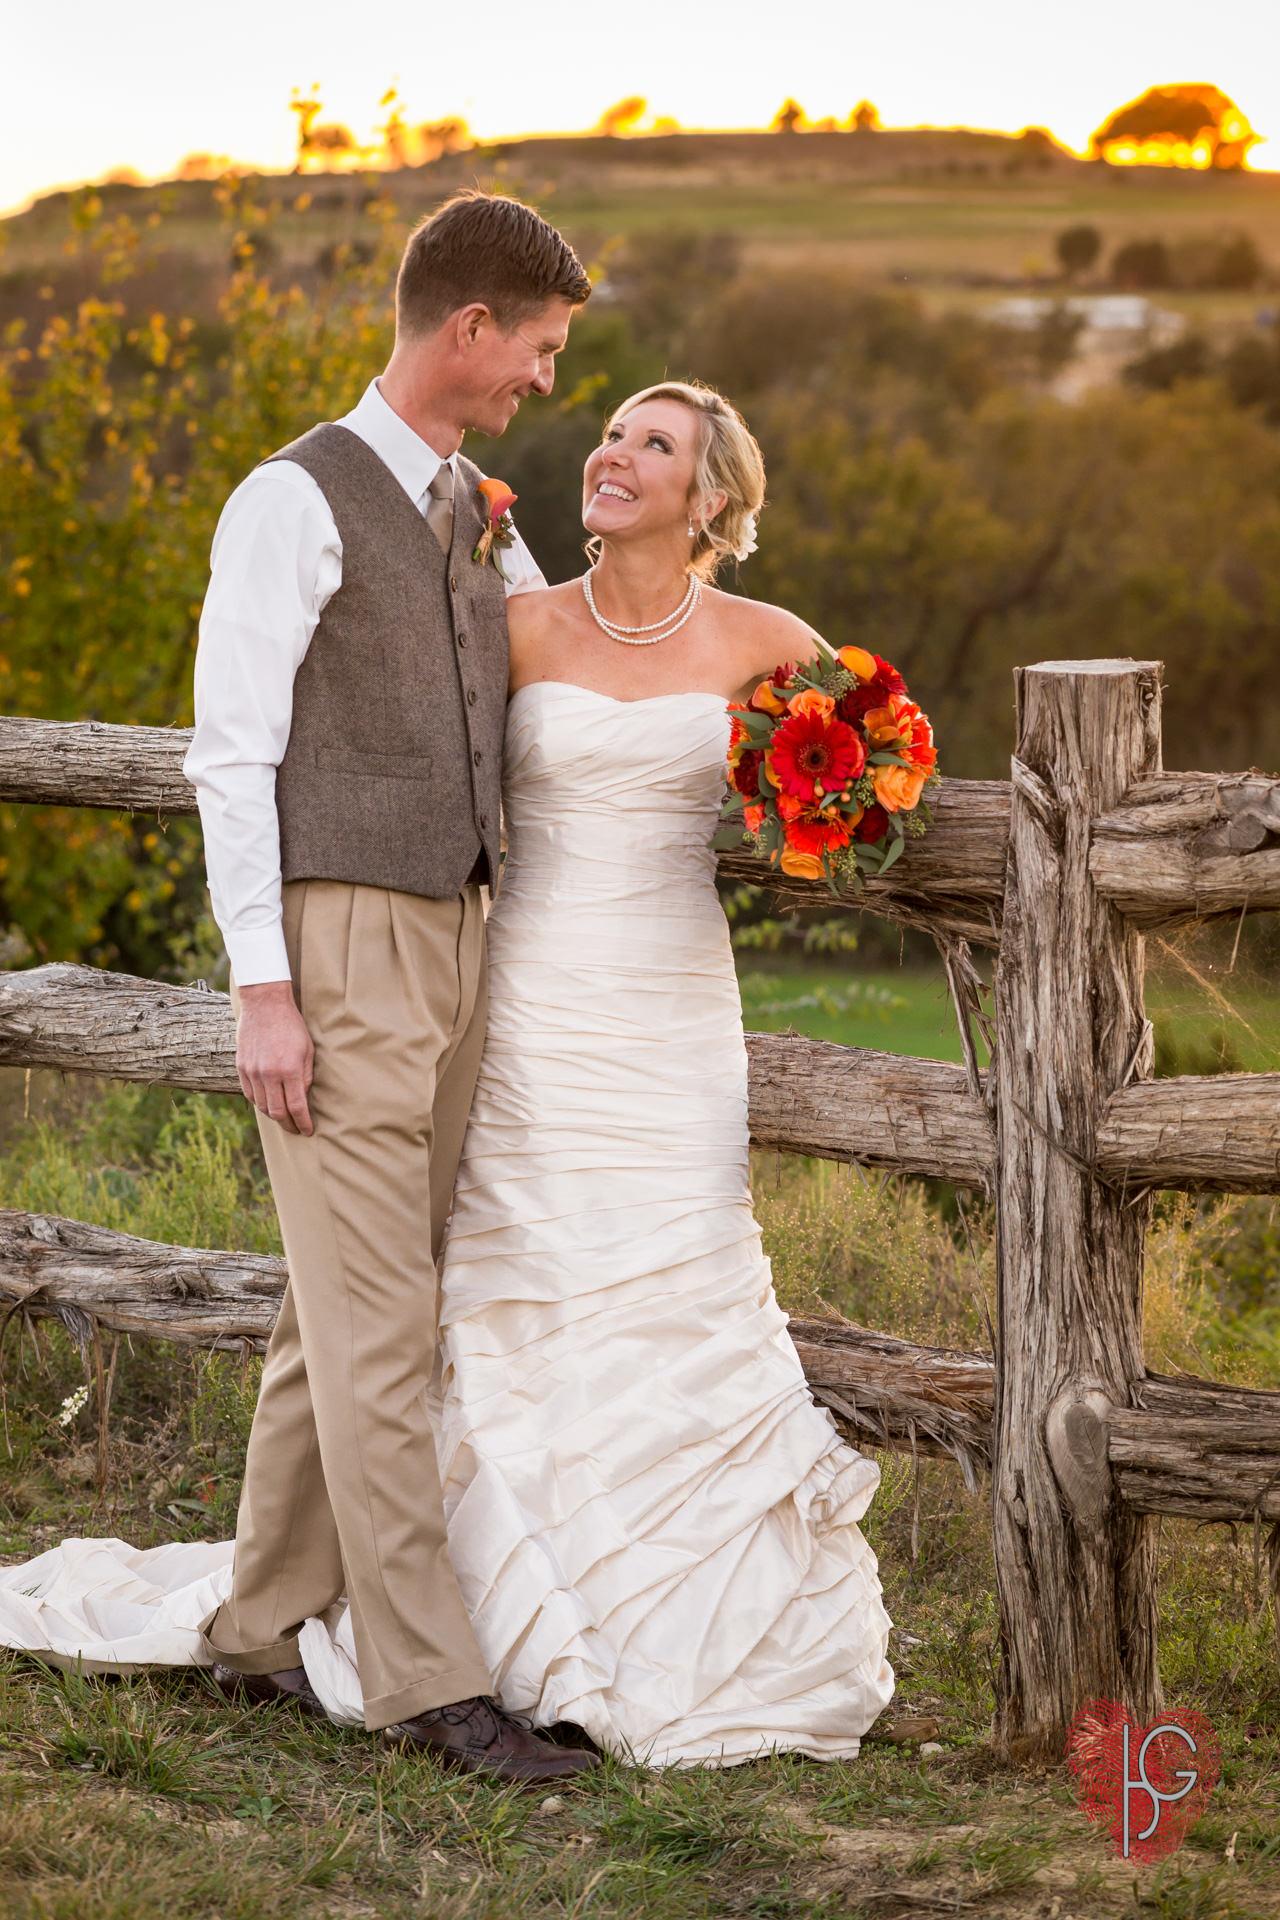 weatherford-wedding-photography-22.jpg